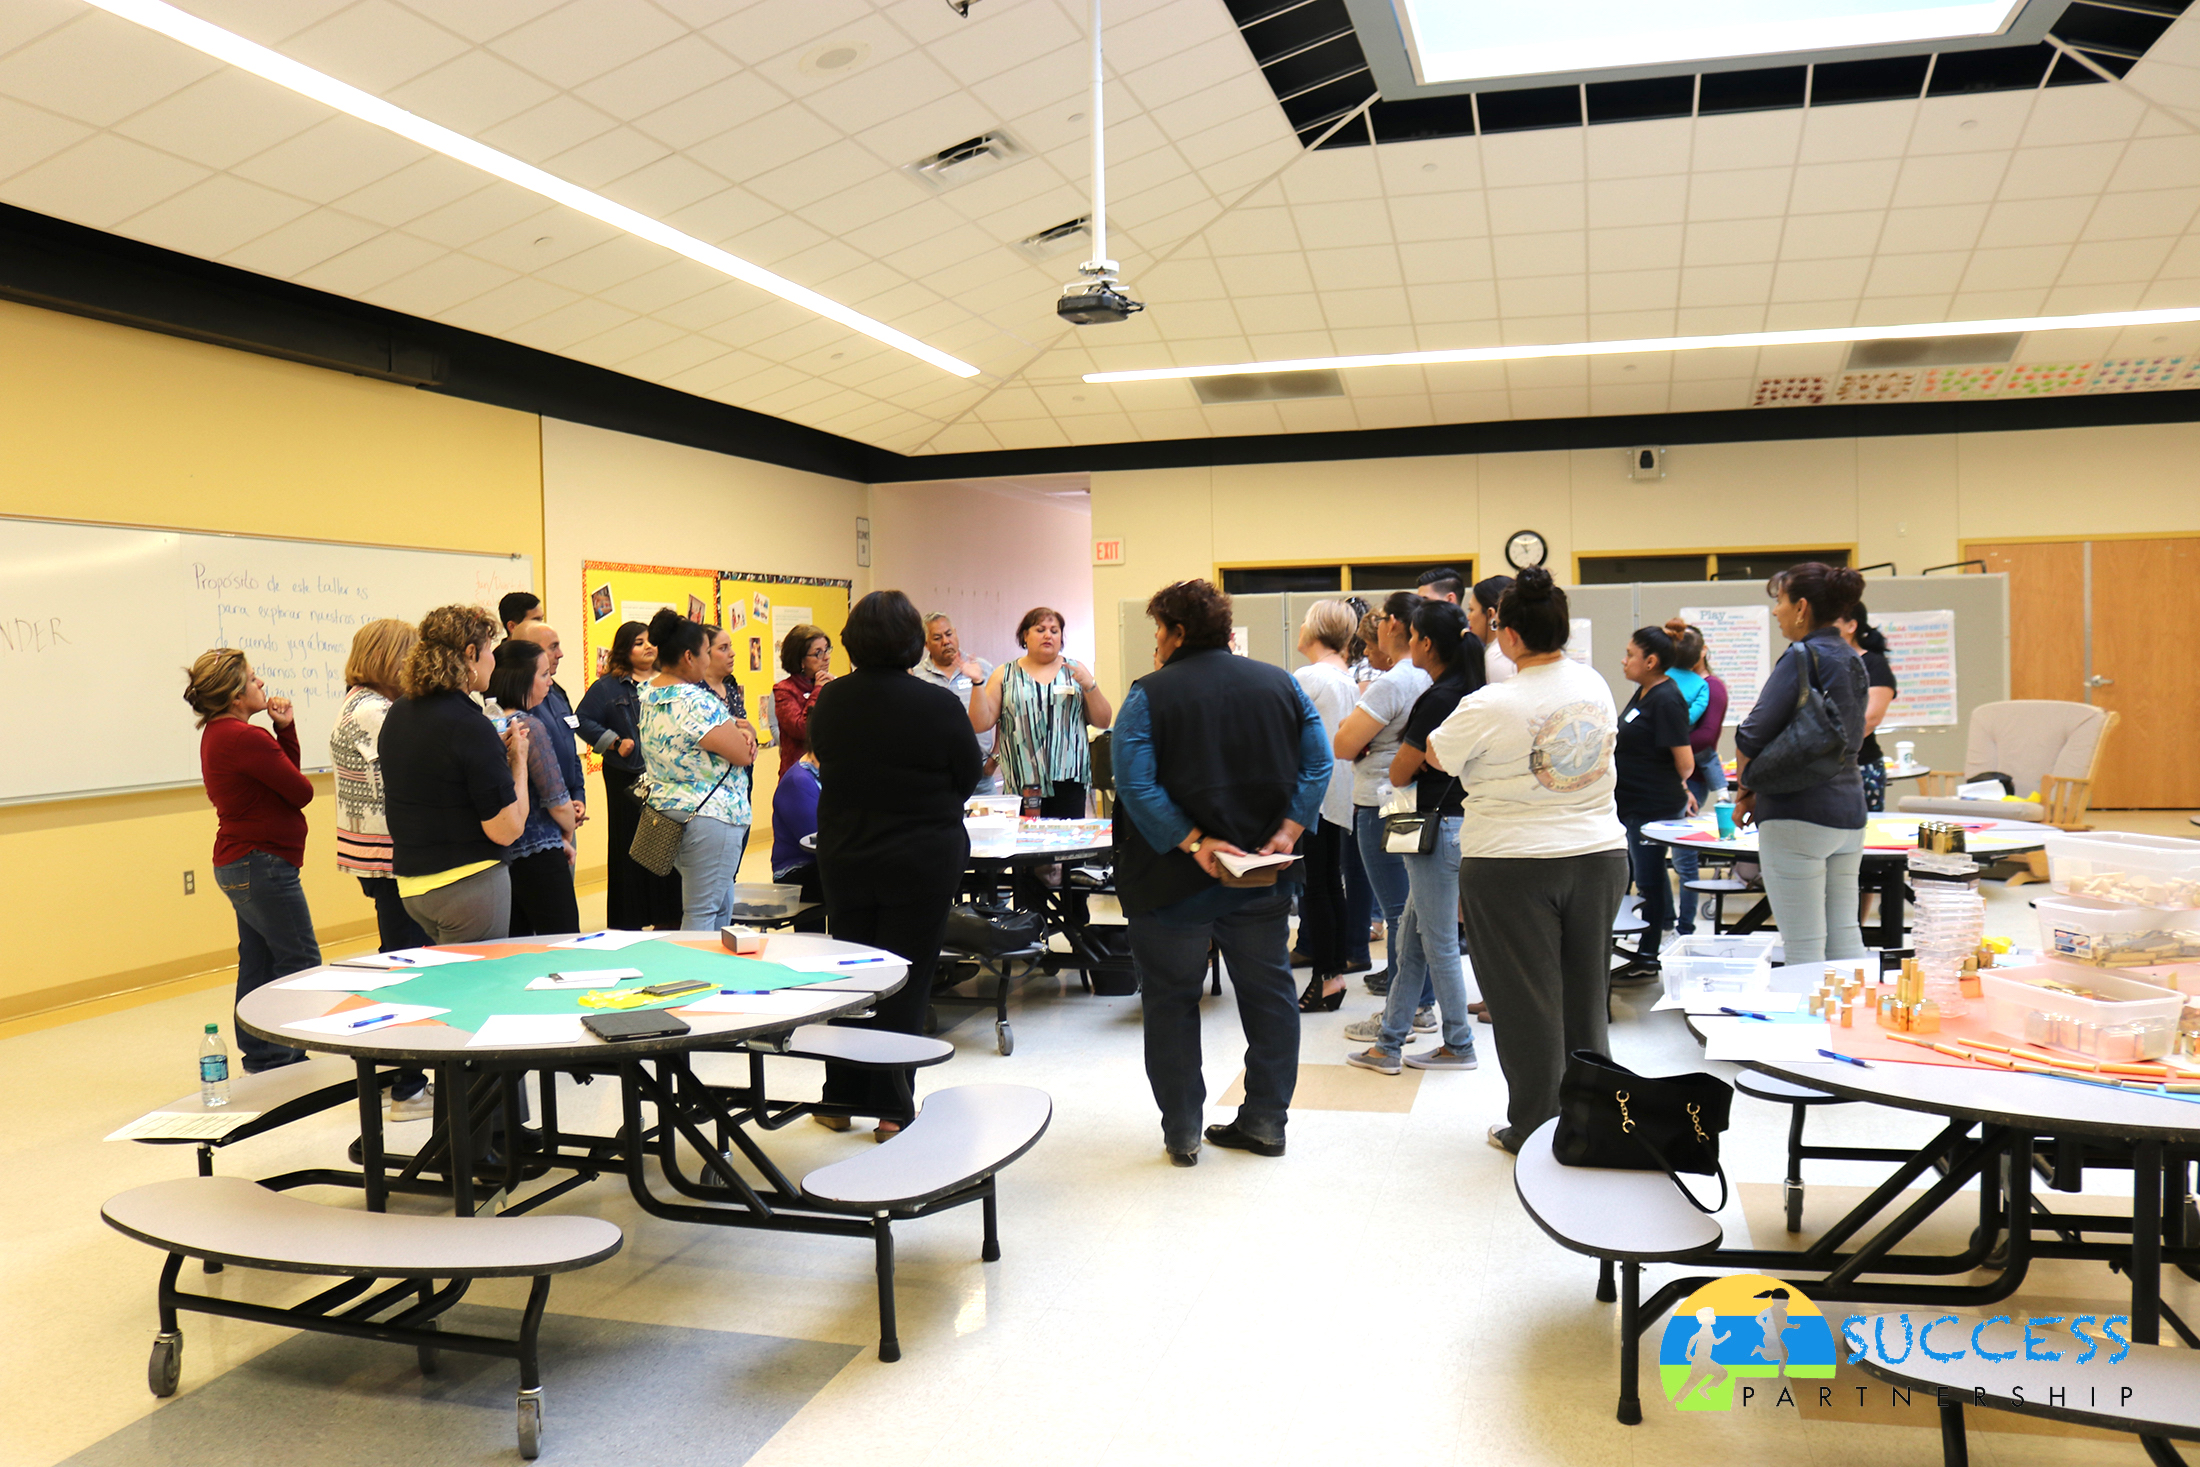 Success Partnership Chaparral Group Discussion